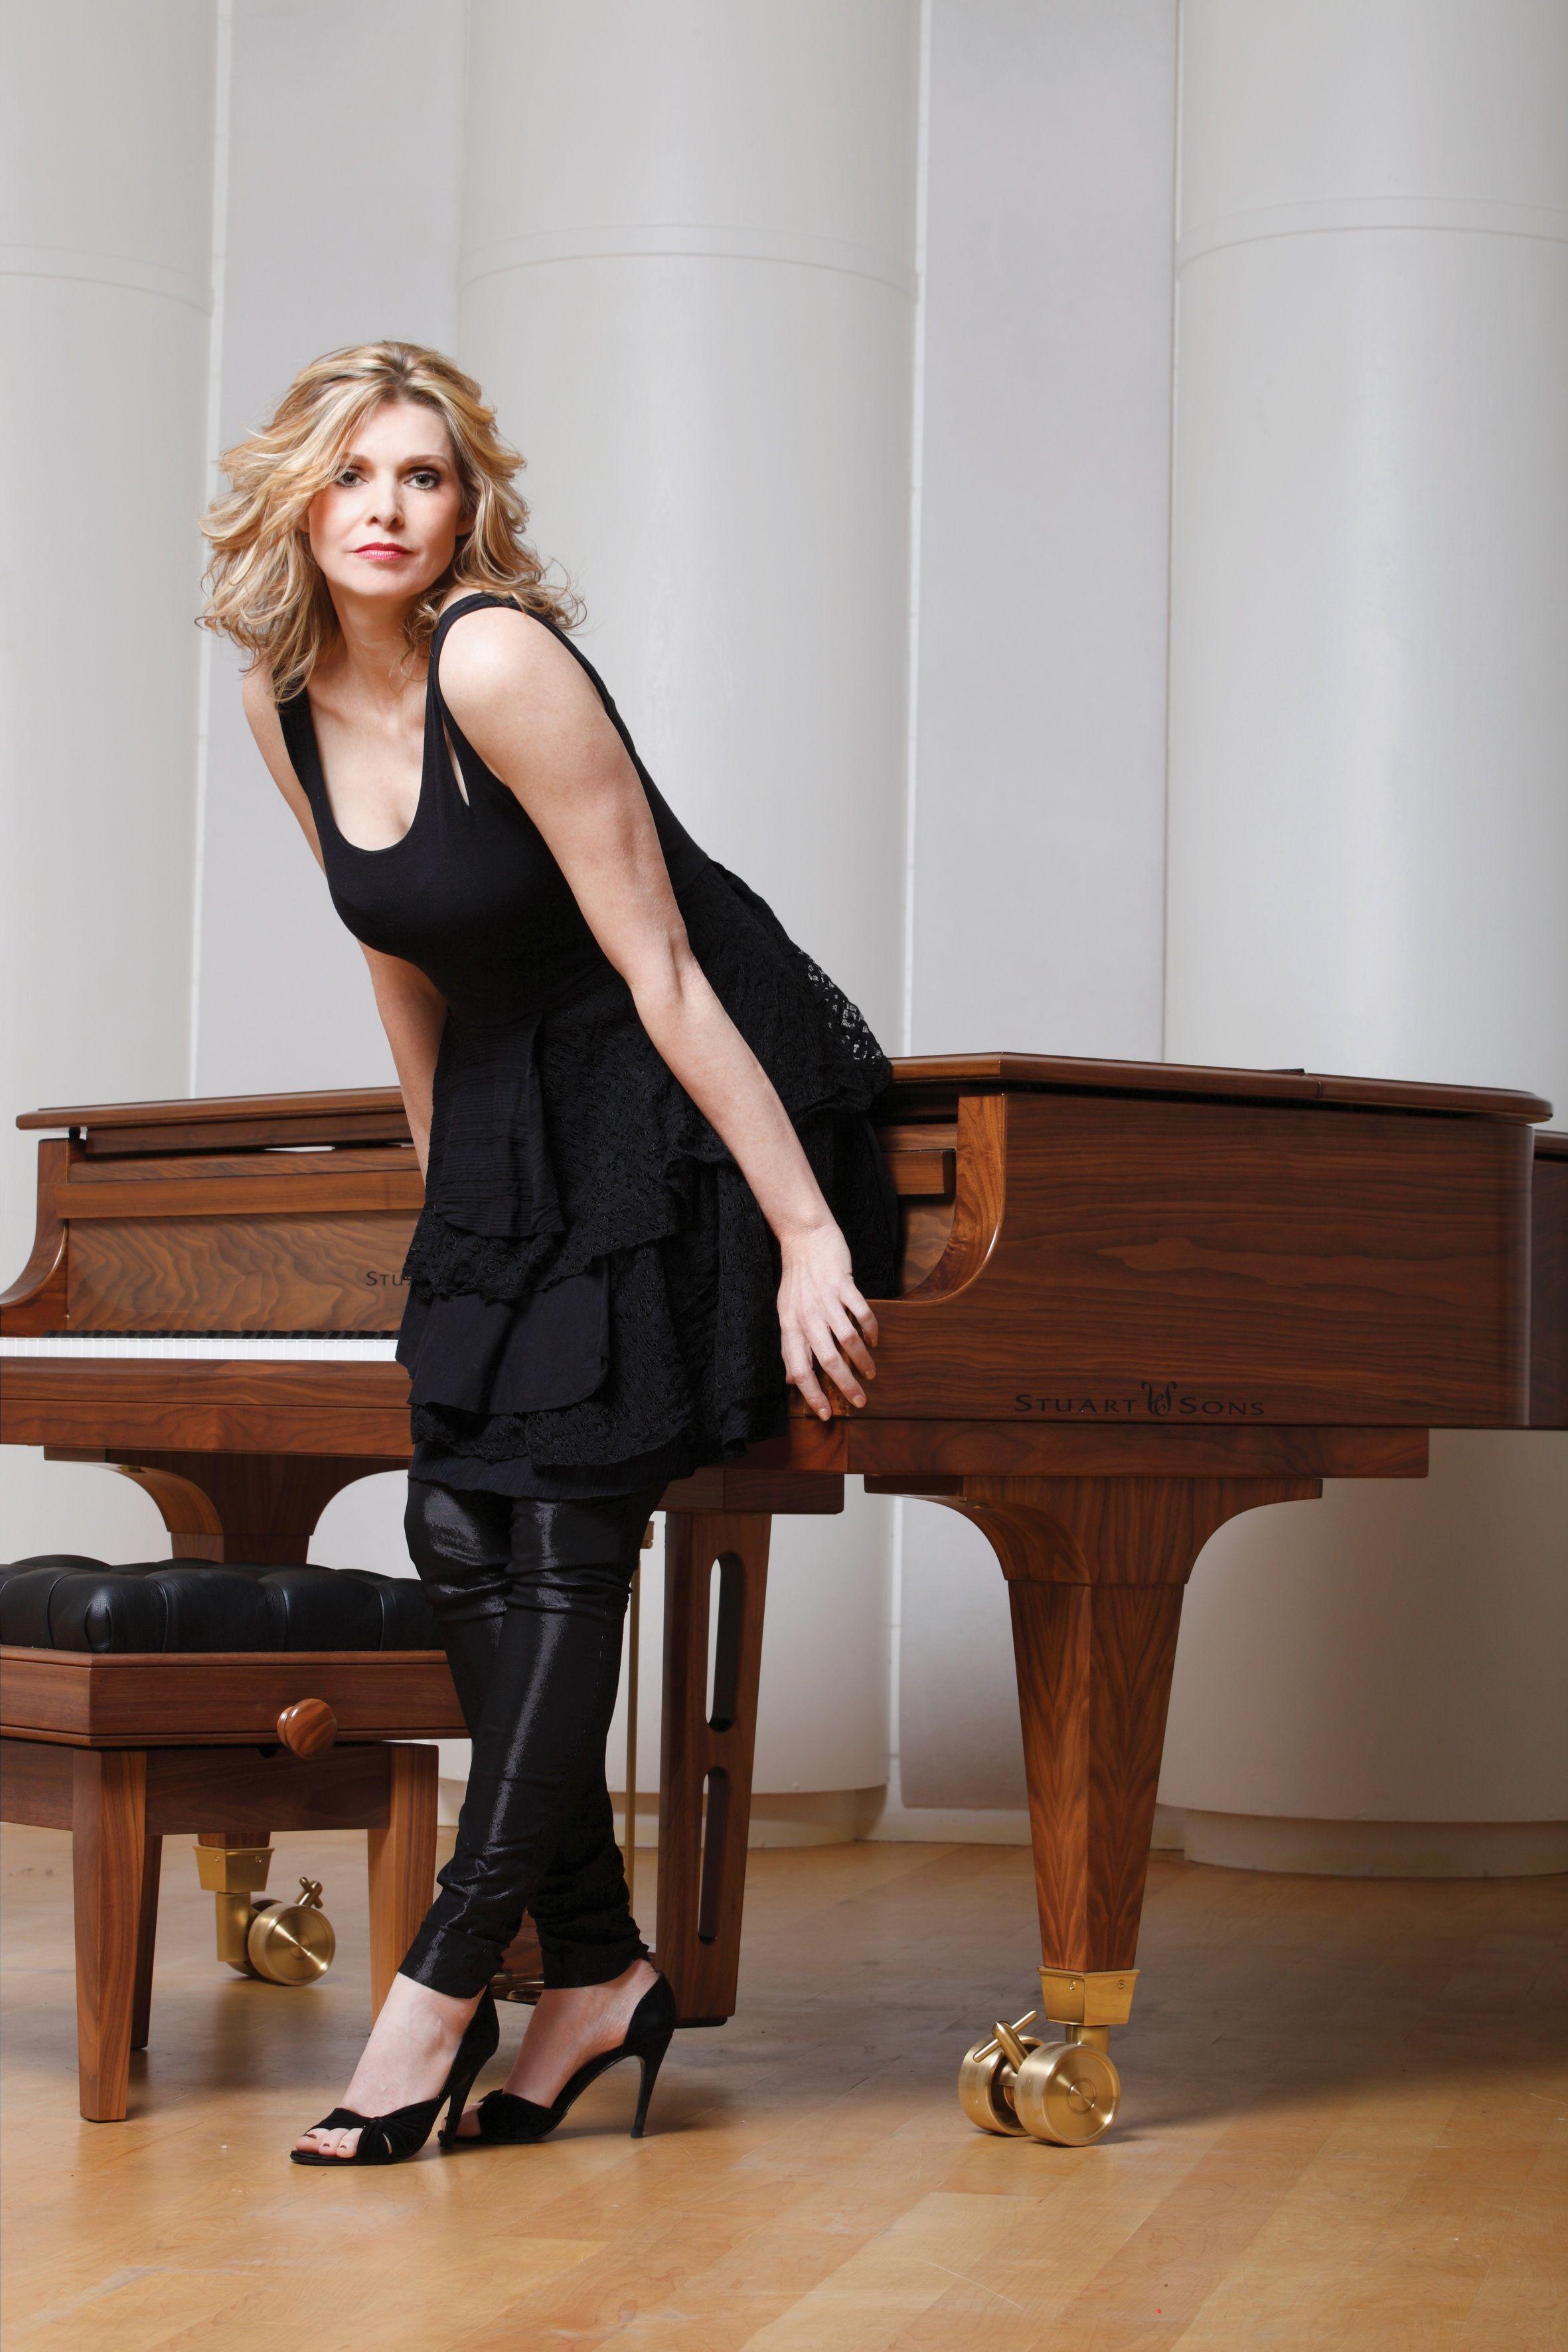 Fiona Joy, Australian Pianist/Singer with Stuart & Sons